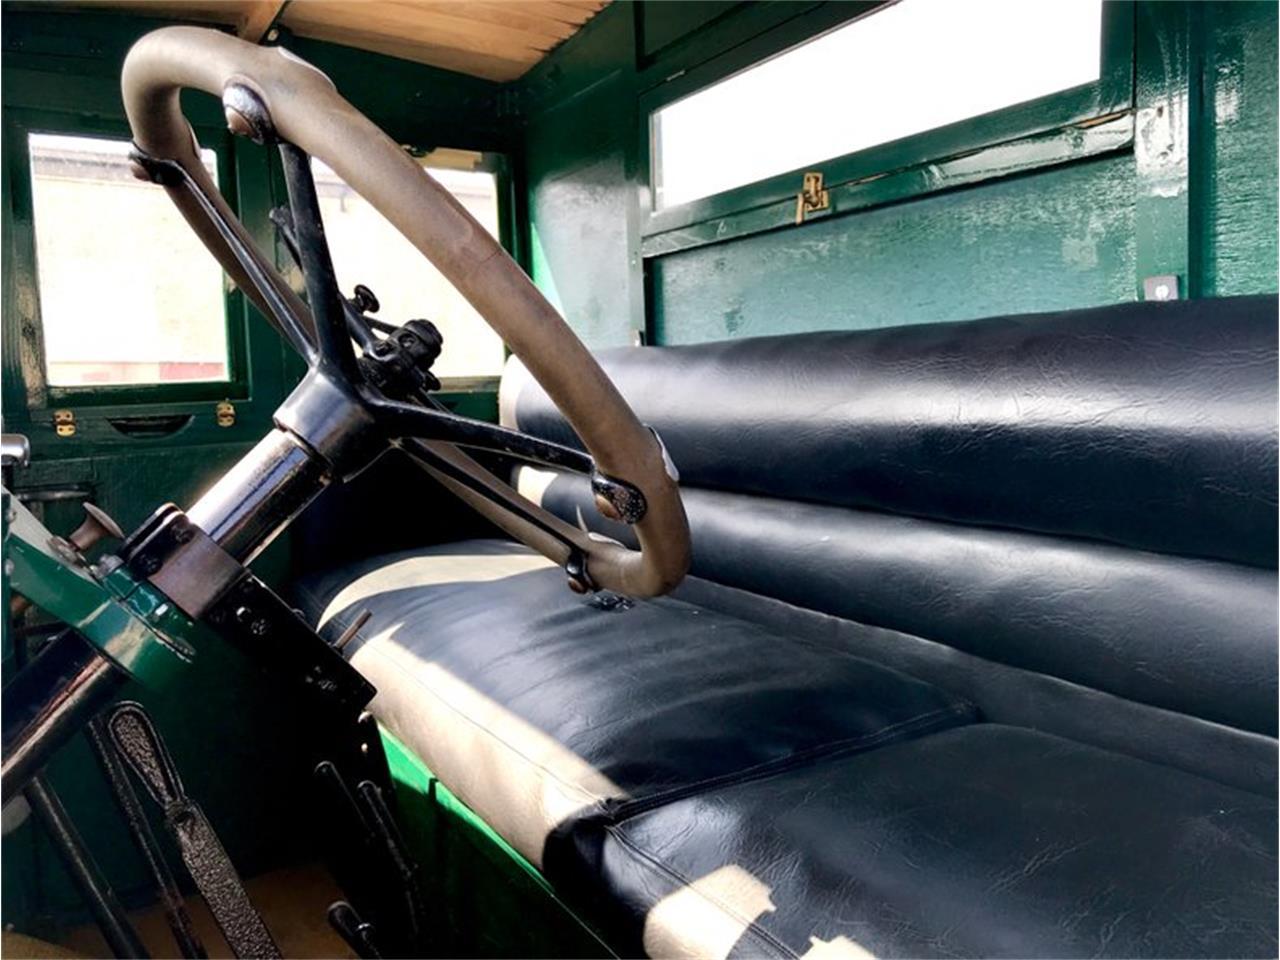 1924 Mack Truck (CC-1186556) for sale in Morgantown, Pennsylvania